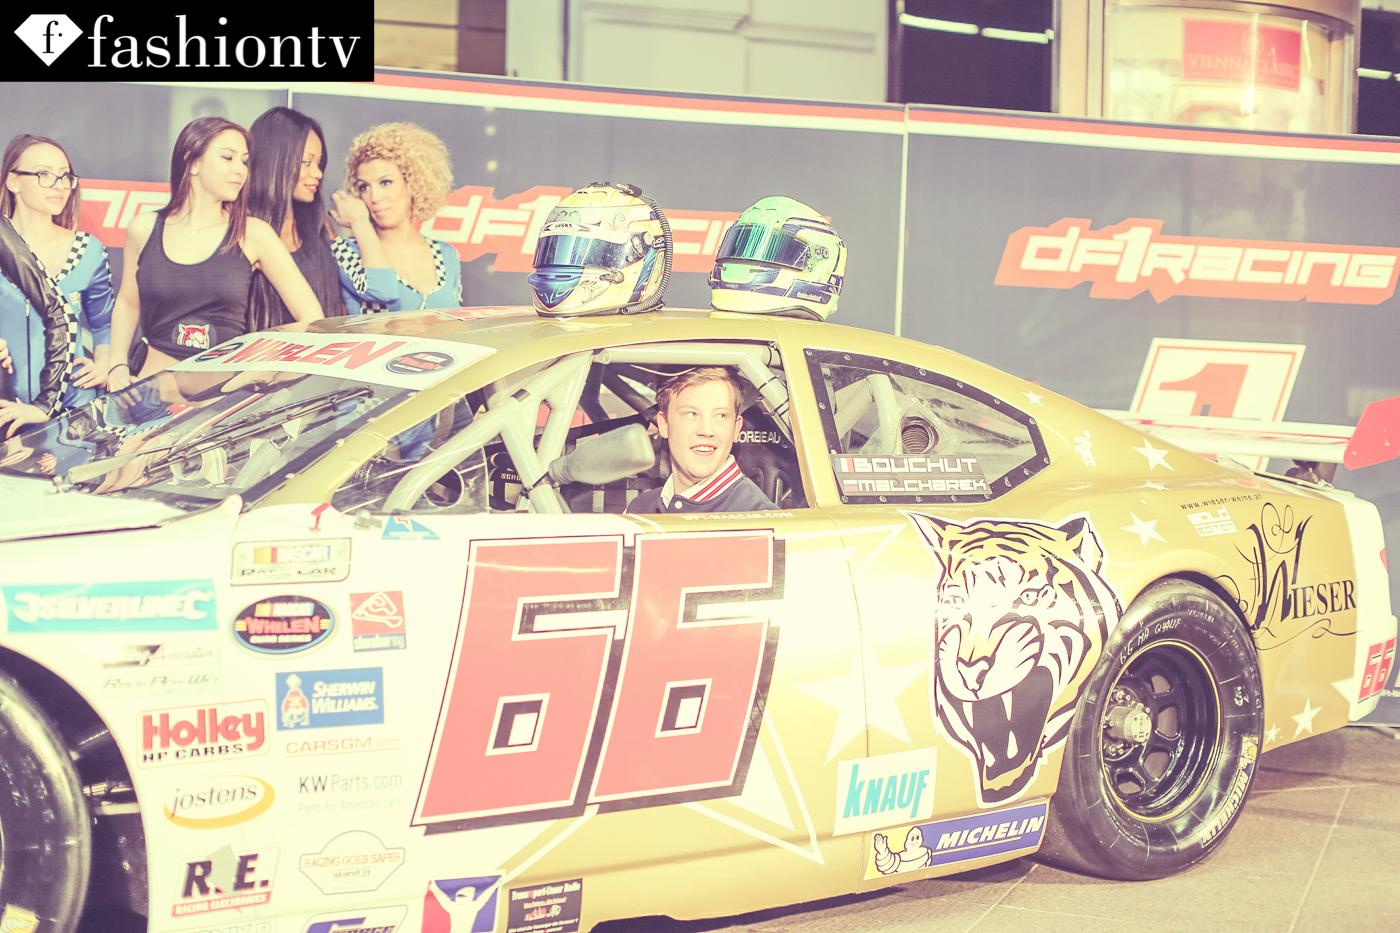 NASCAR DF1 RACING NIGHT